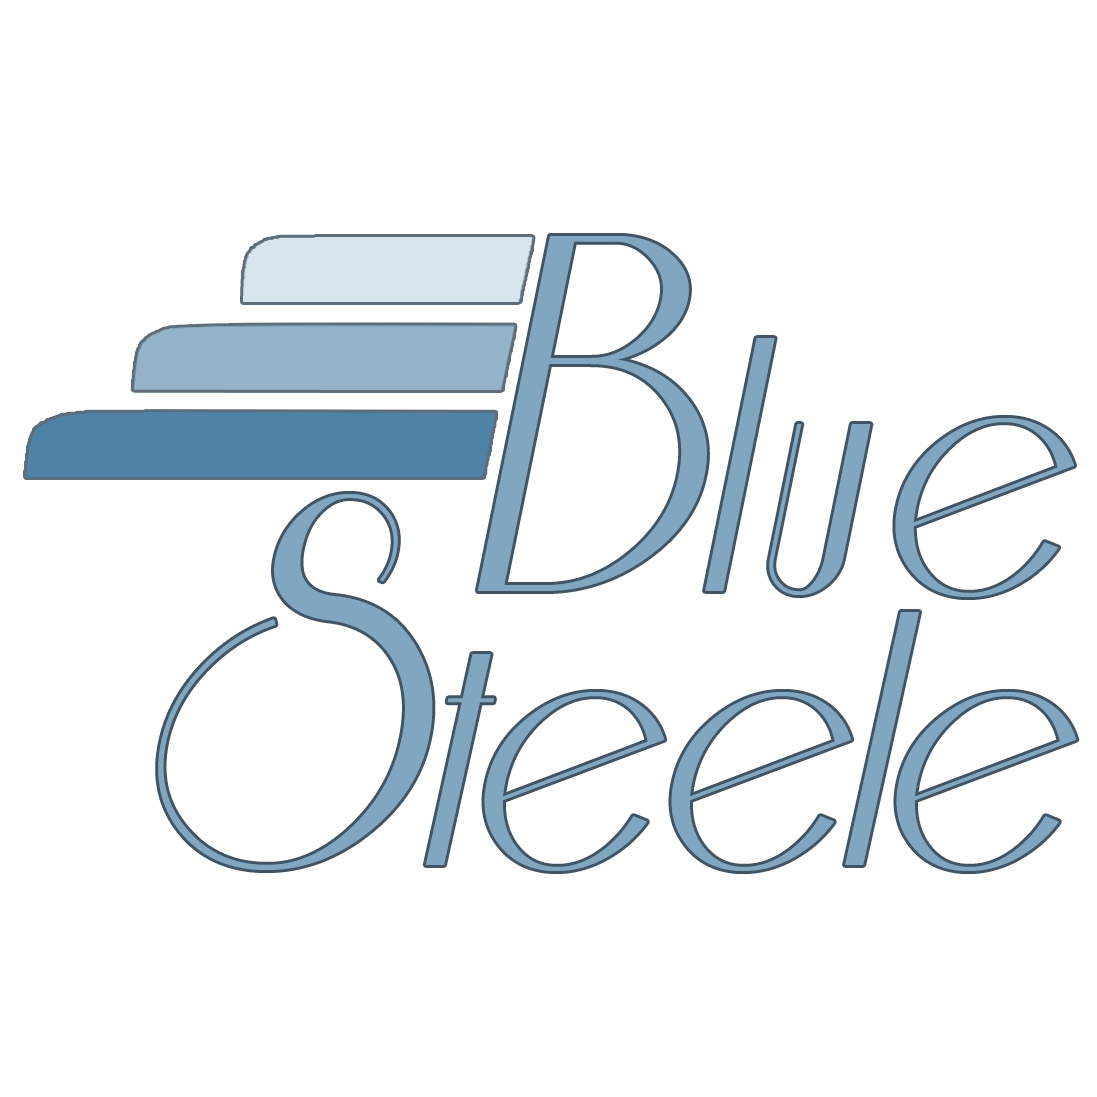 Bluesteele logo 11 23 2017 fb square